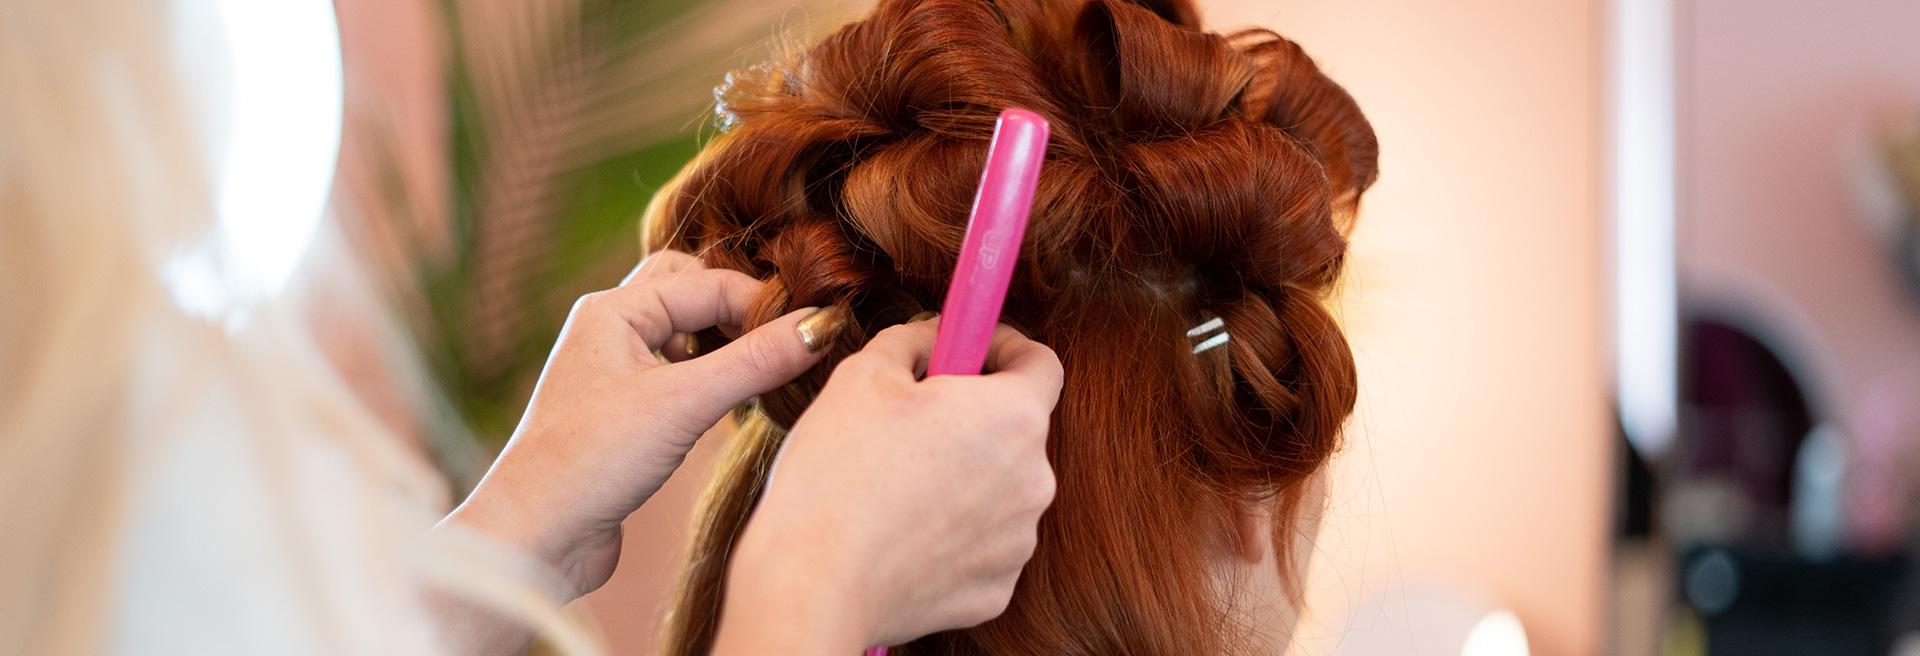 Hair Salons Center City Philadelphia The Rittenhouse Spa Club